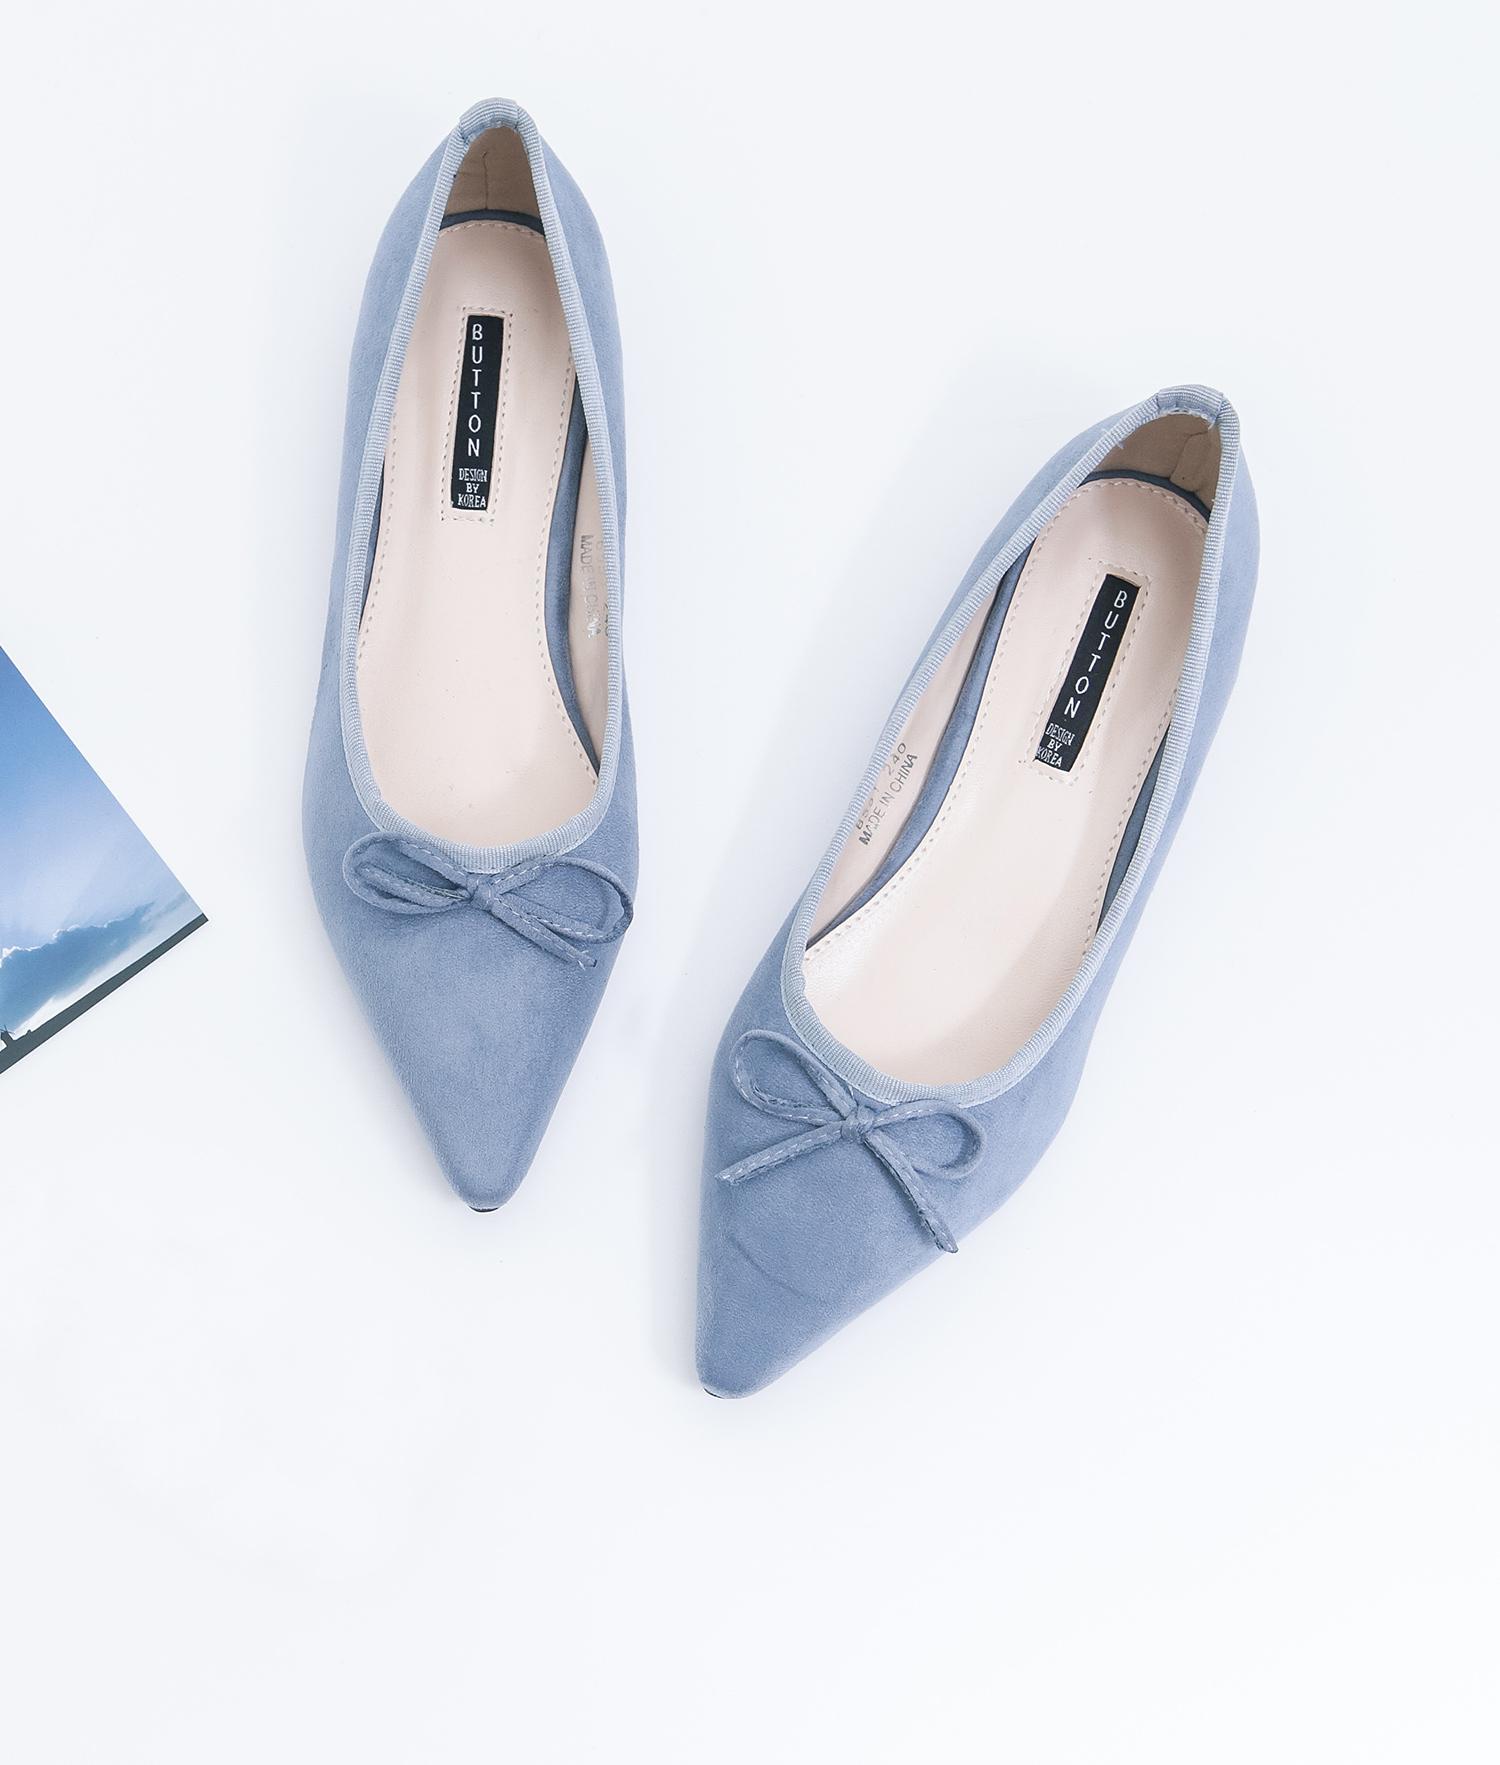 d68061904b2 AnnaKastle Womens Cute Bow Pointed Toe Ballerina Flats Blue